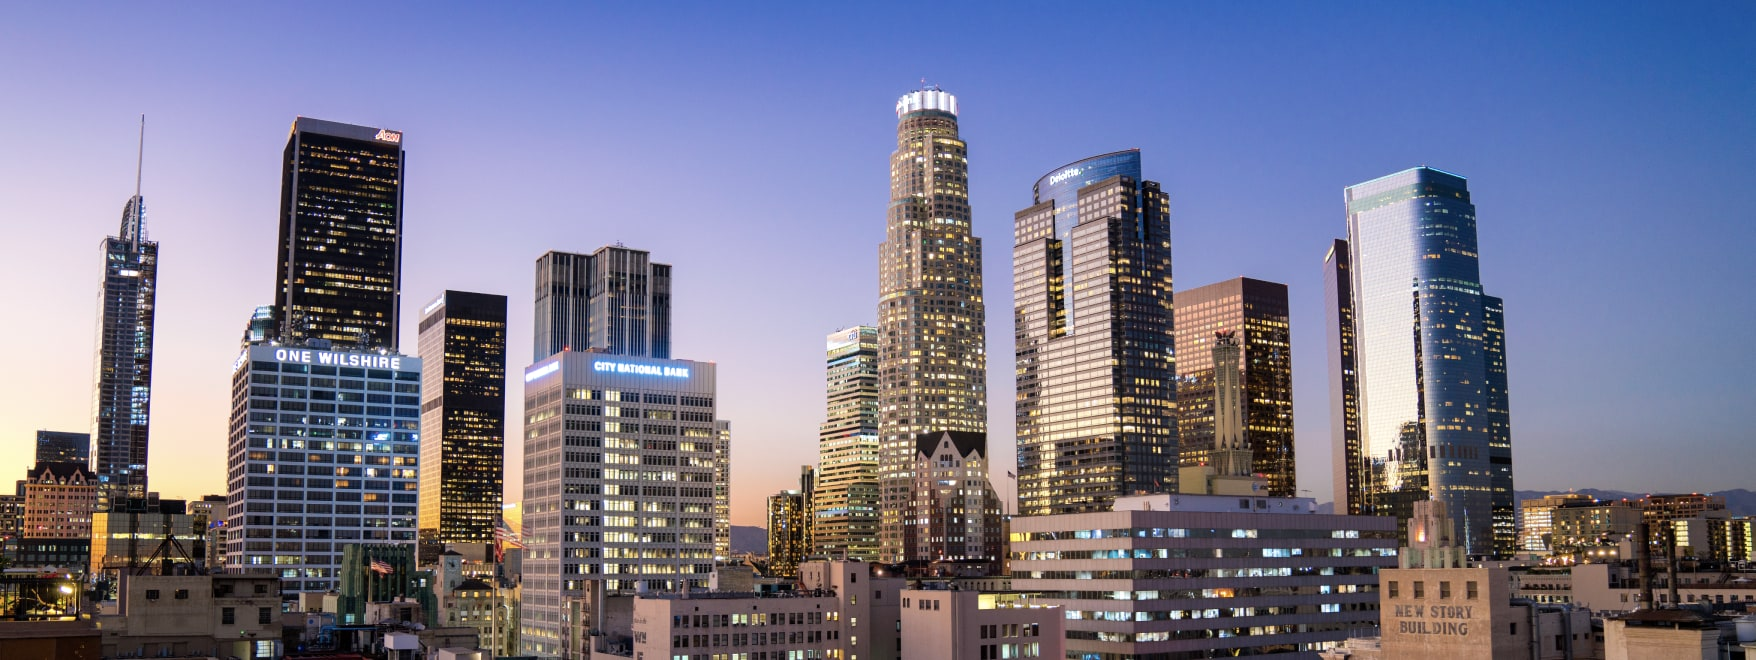 Los Angeles Data Centers